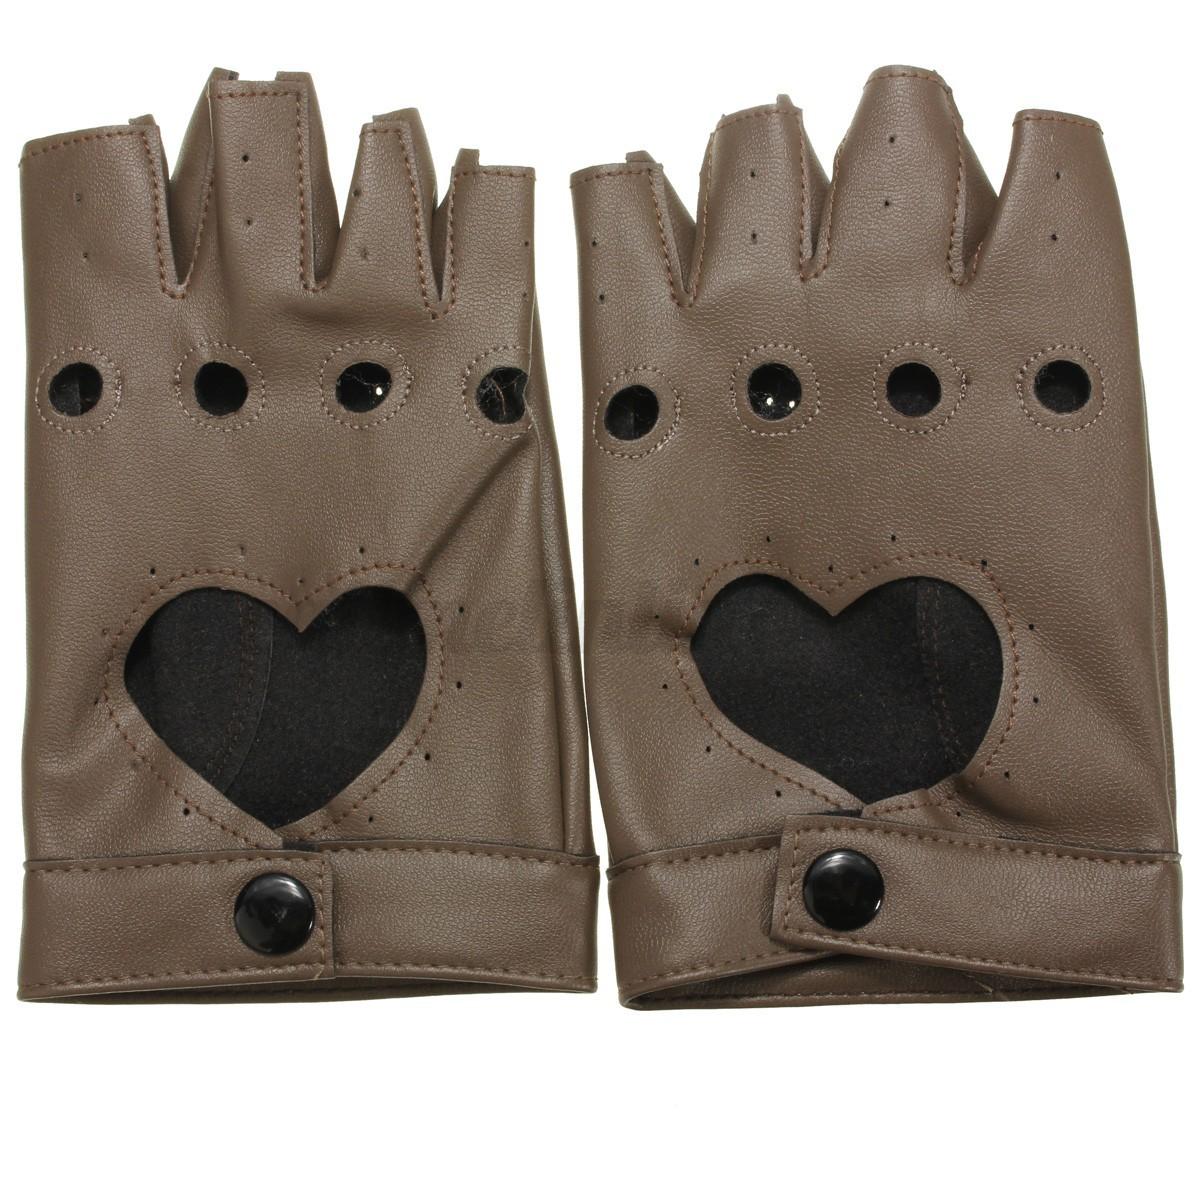 punk gants mitaines poign e doigts cuir v lo moto conduite court cosplay adulte ebay. Black Bedroom Furniture Sets. Home Design Ideas